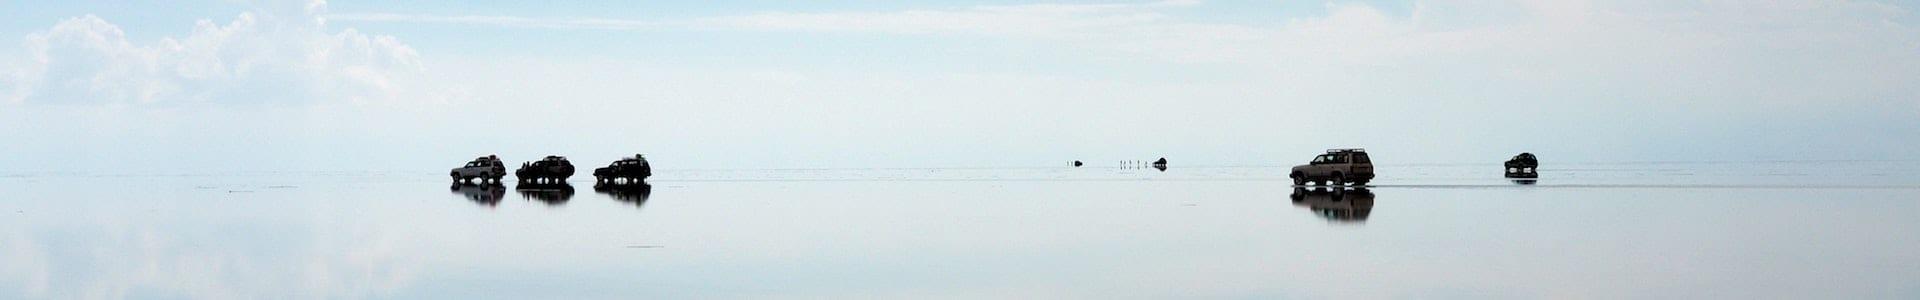 Latin America Bolivia Salt Flats